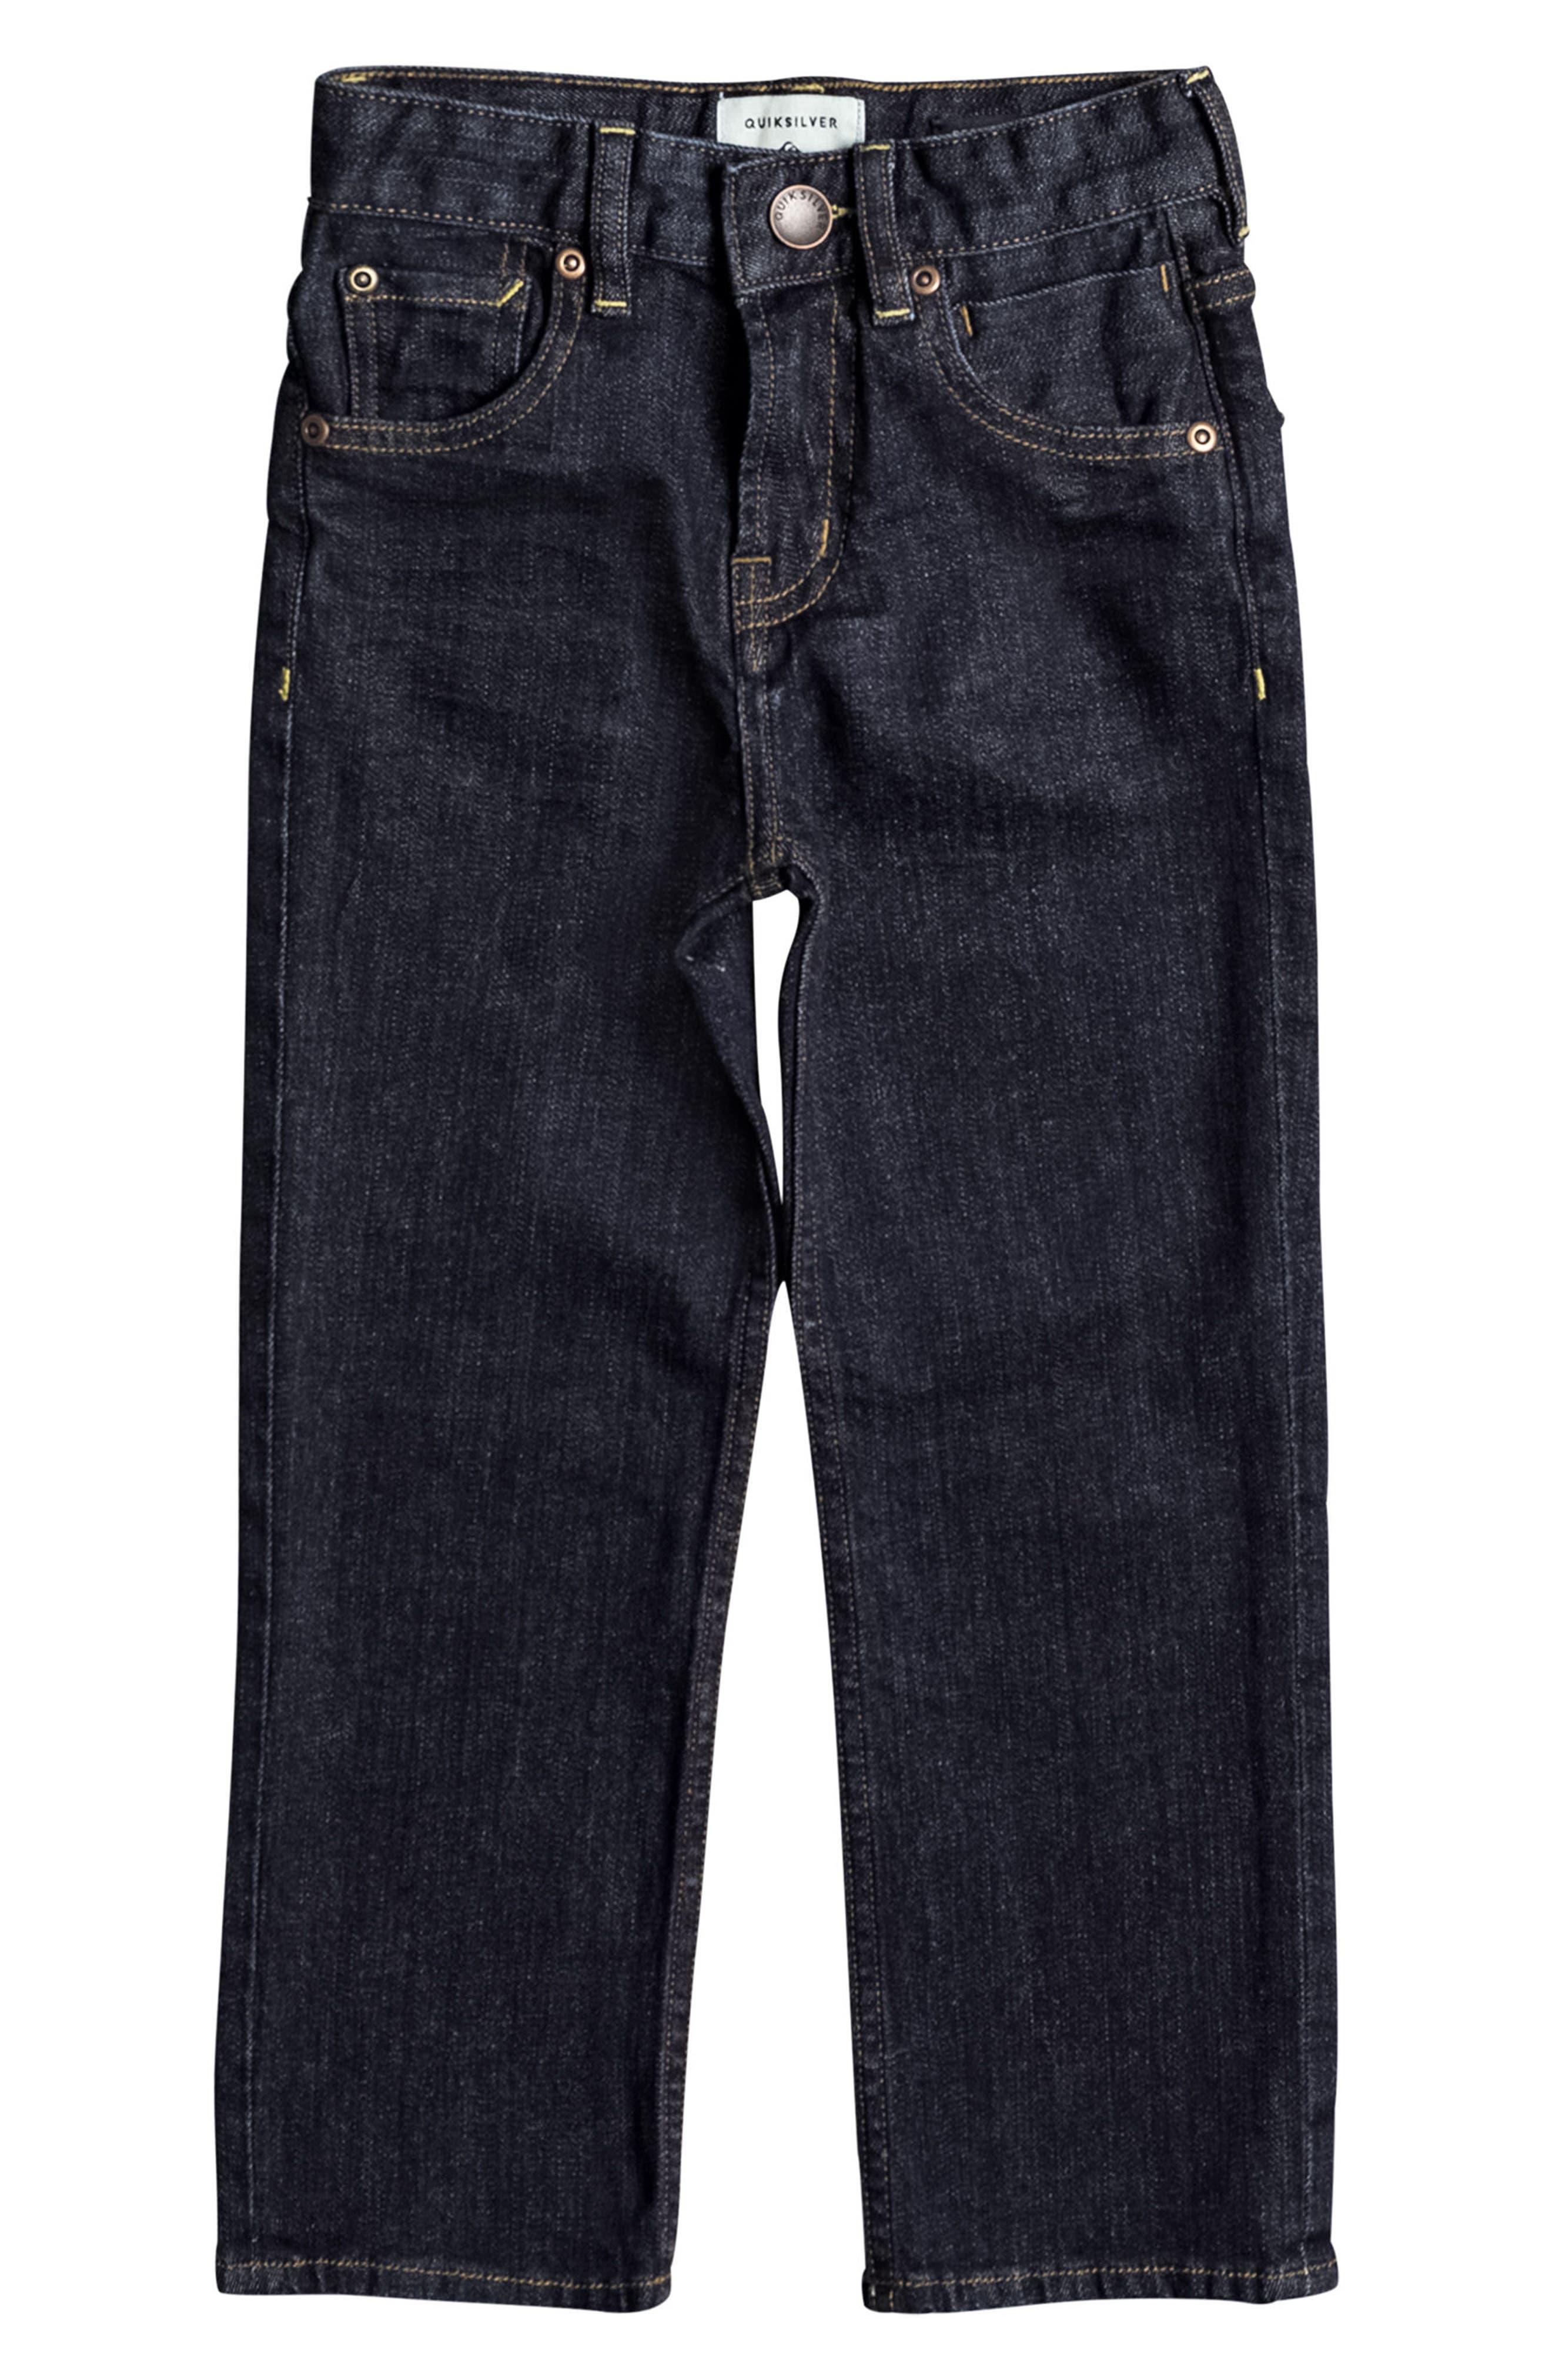 Main Image - Quiksilver Sequel Rinse Jeans (Toddler Boys & Little Boys)